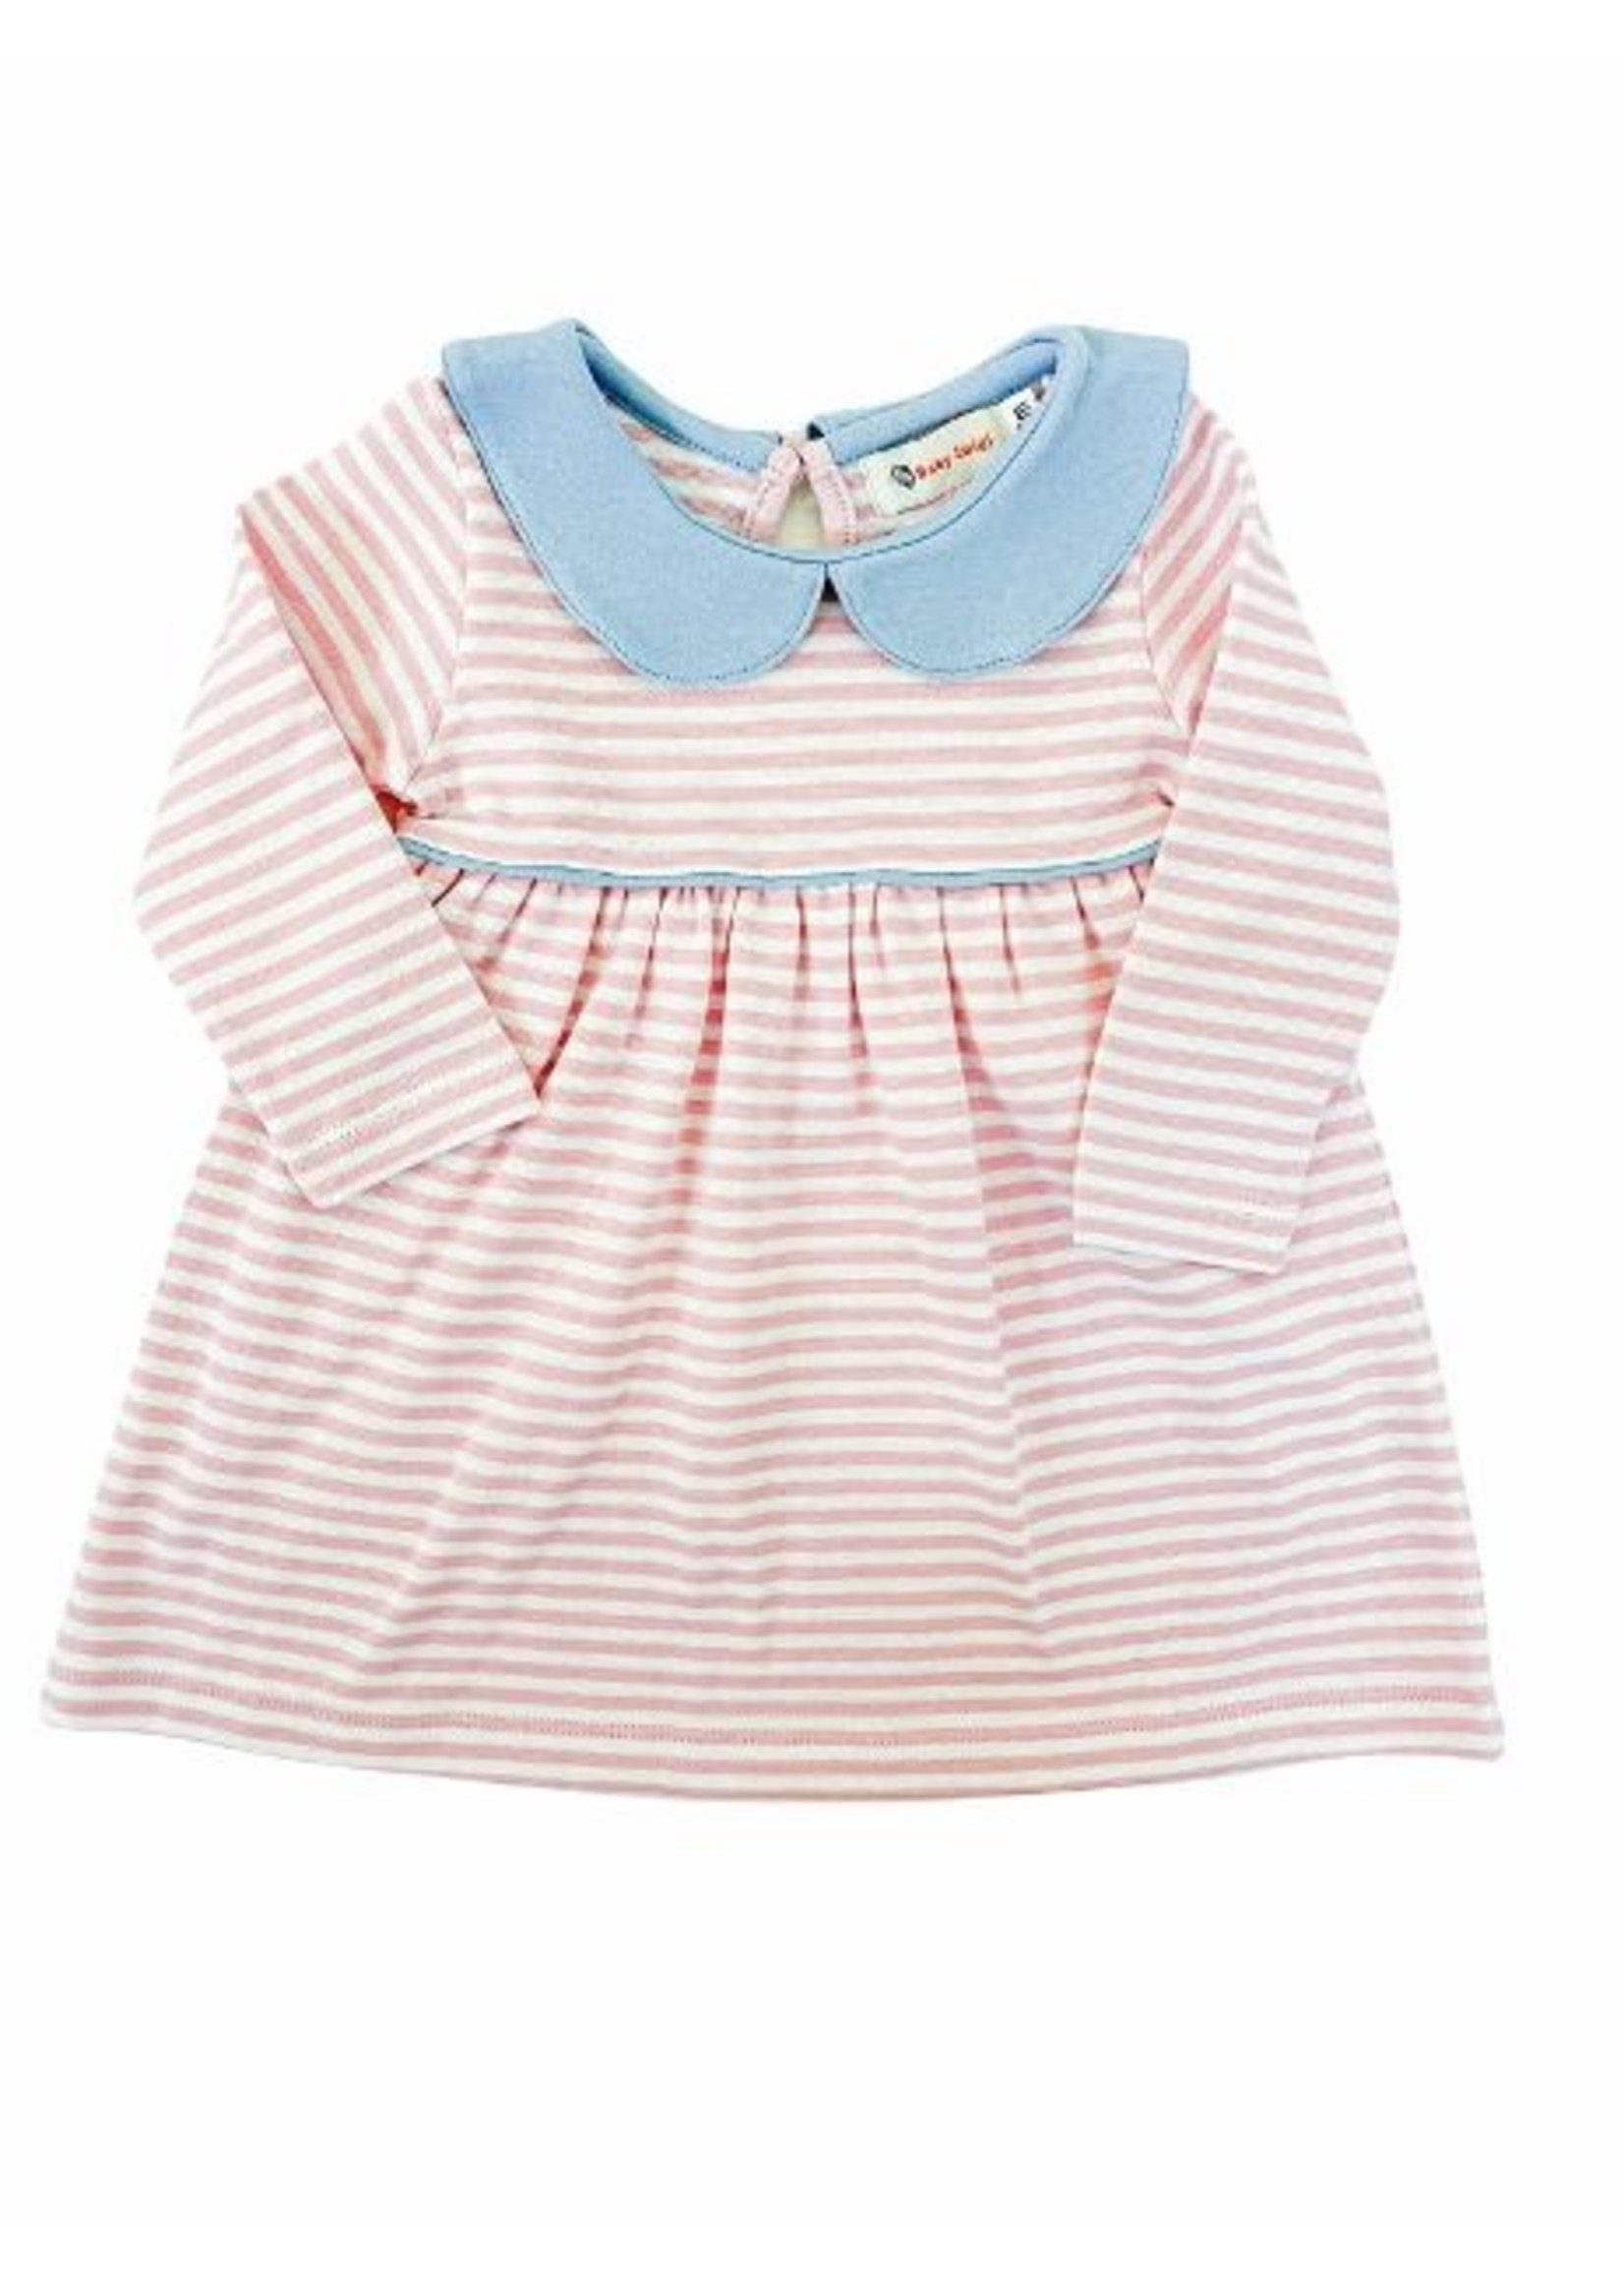 Luigi Pink & White Stipe Dress w/ blue trim